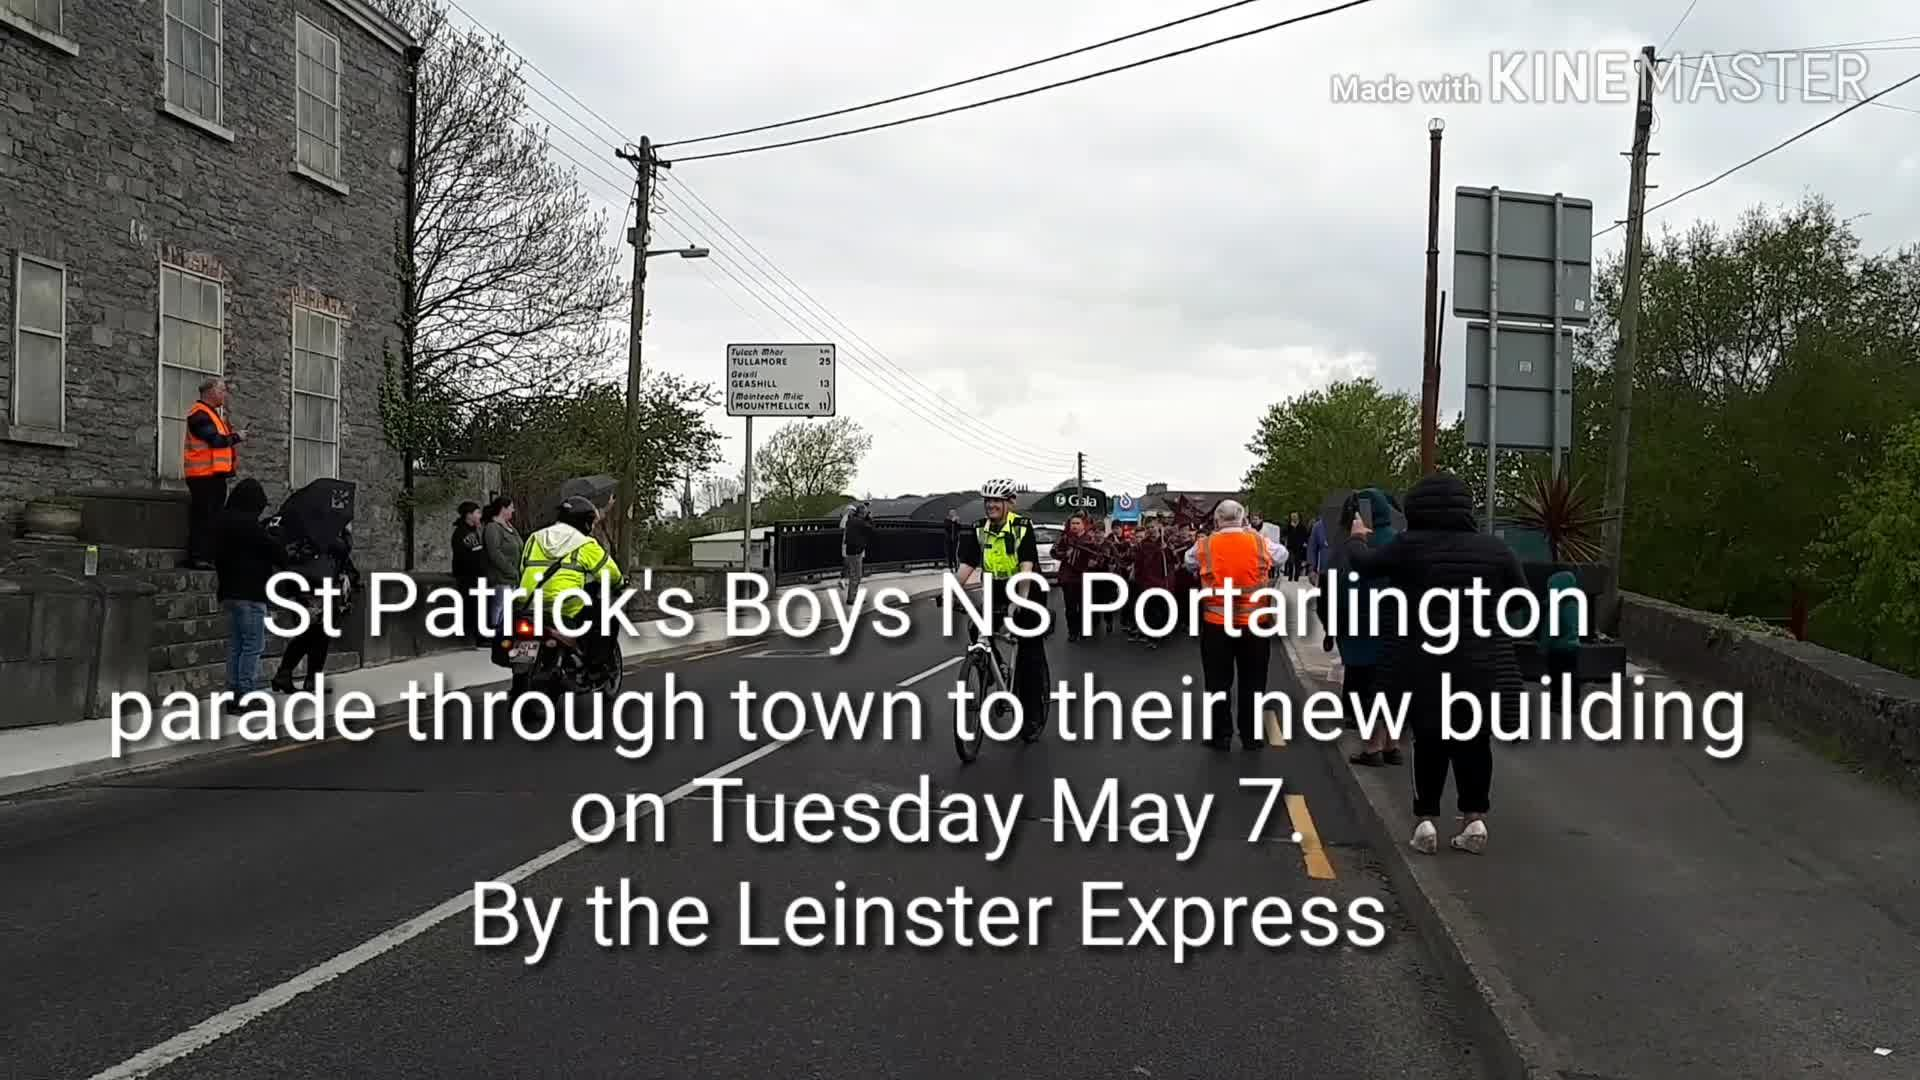 Portarlington to Daingean - 3 ways to travel via line 829 bus